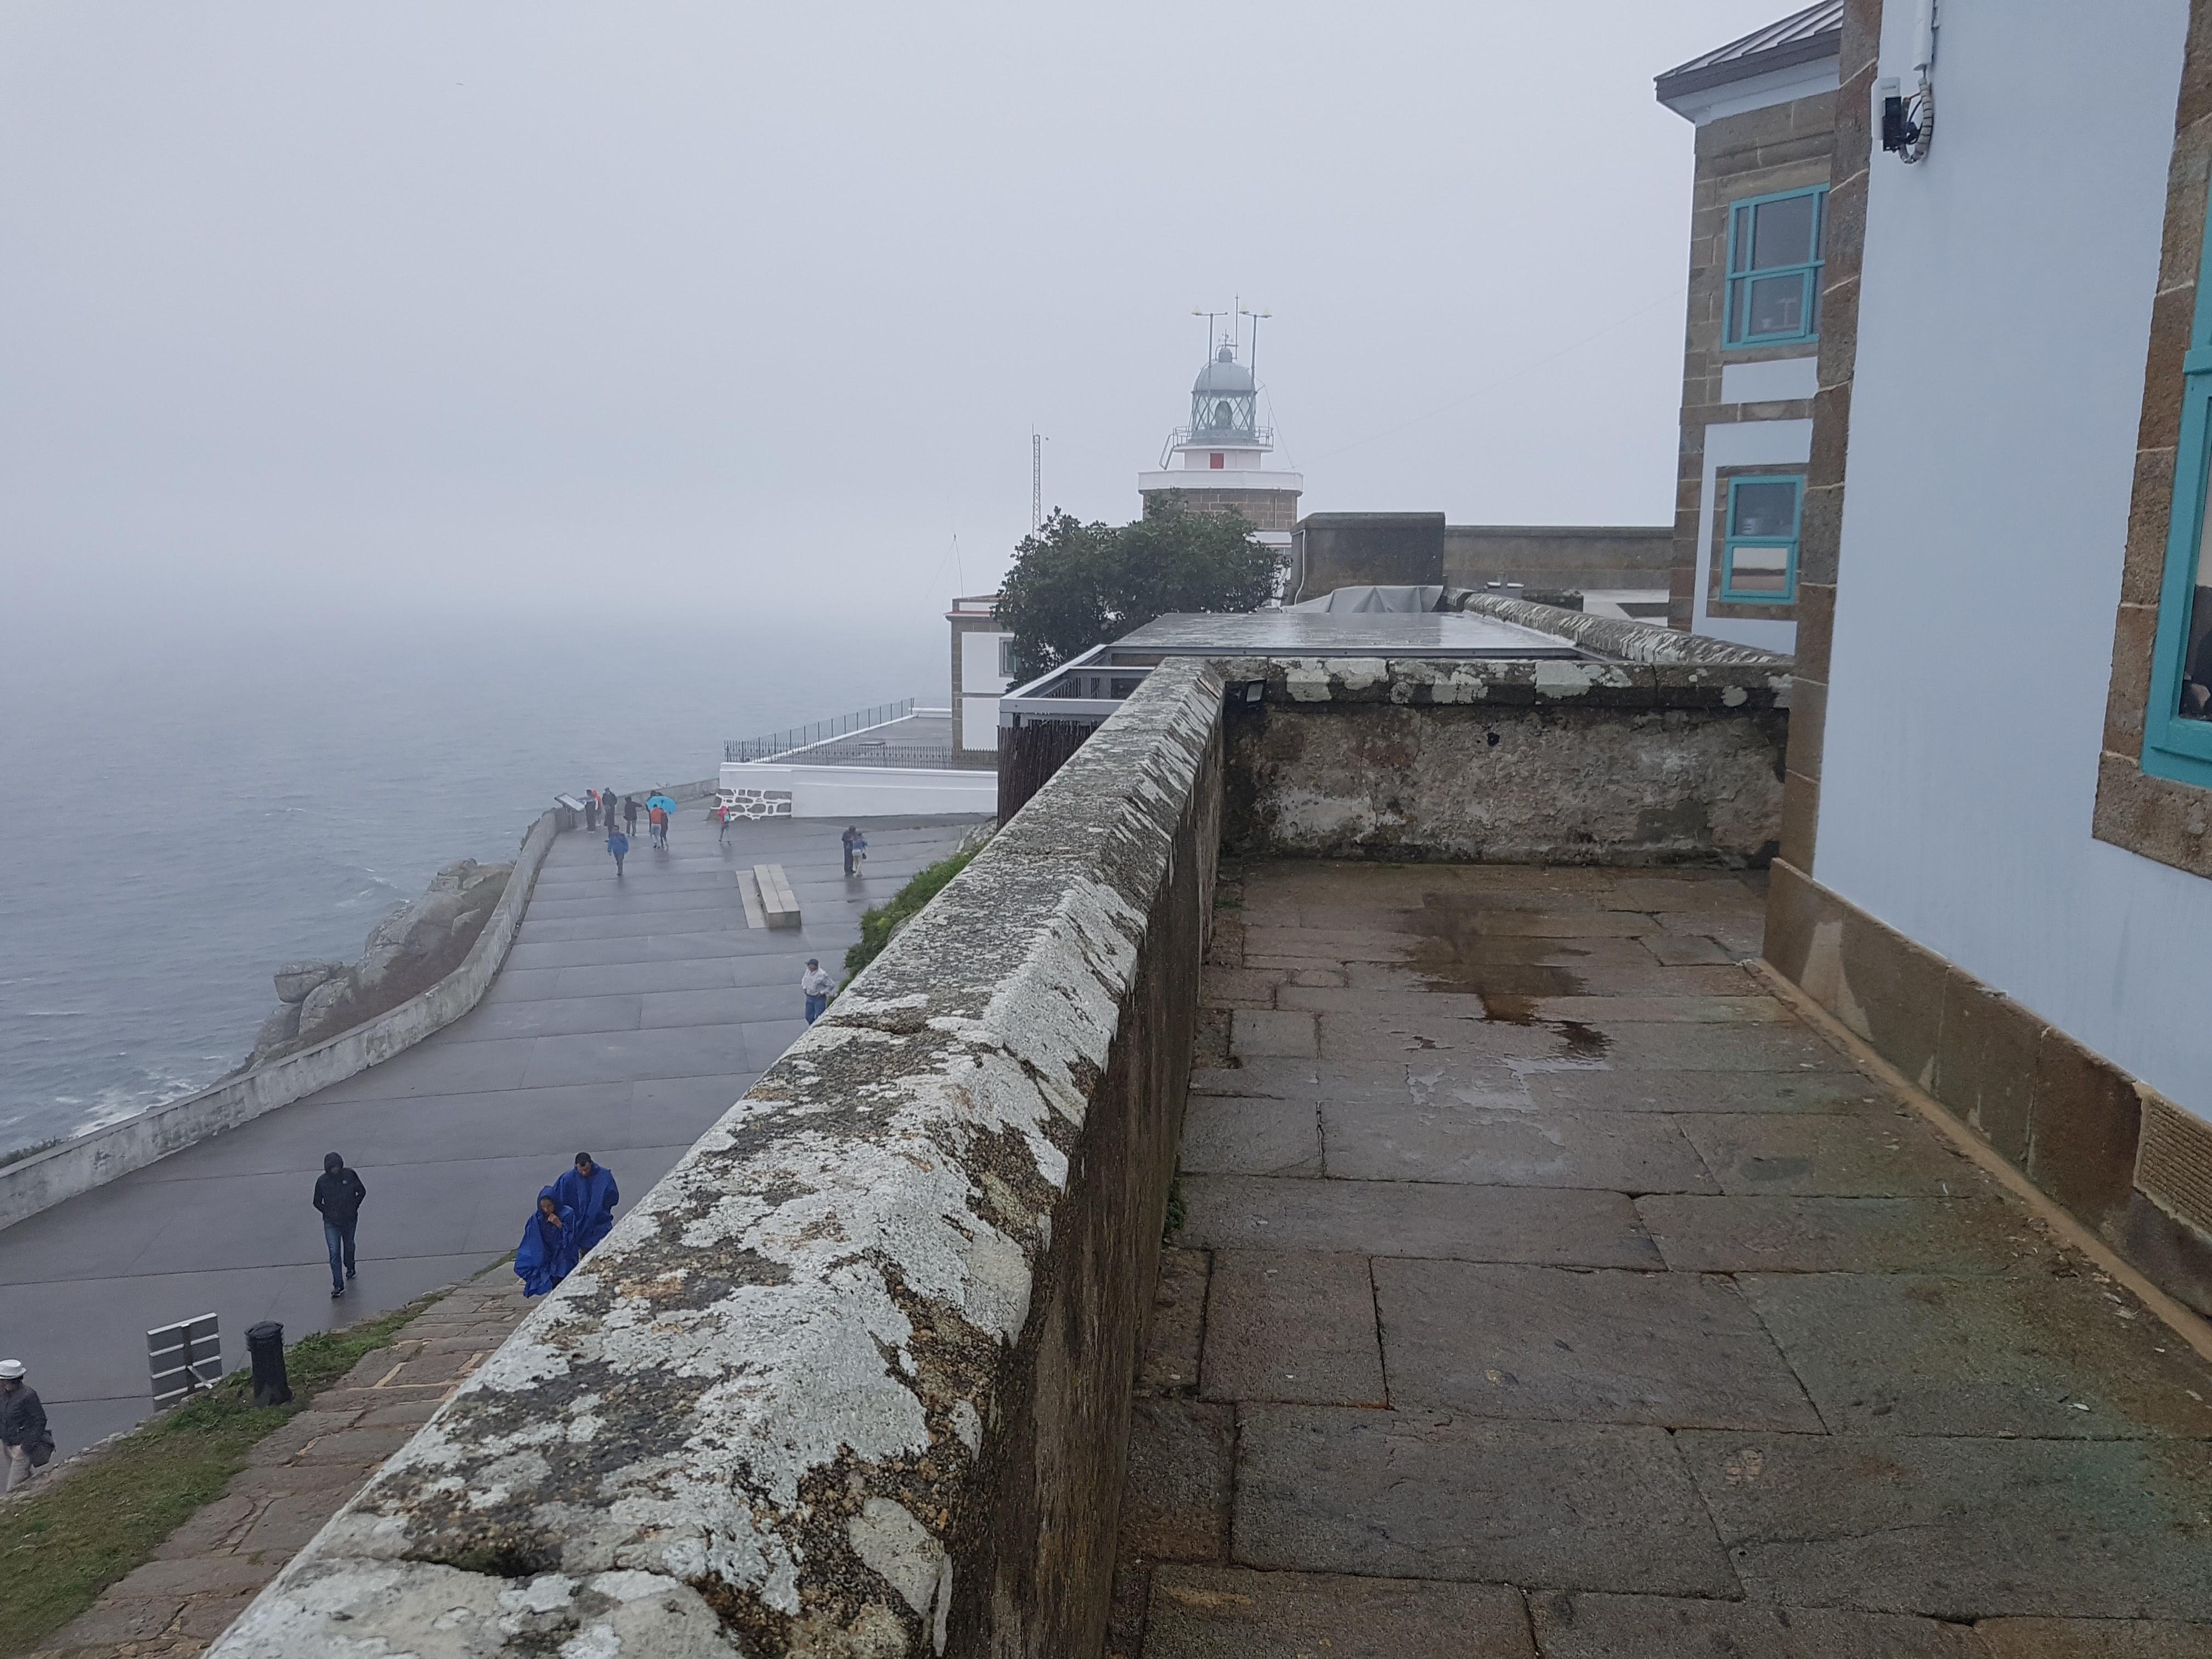 Hotel O Semáforo con el Faro de Finisterre al fondo